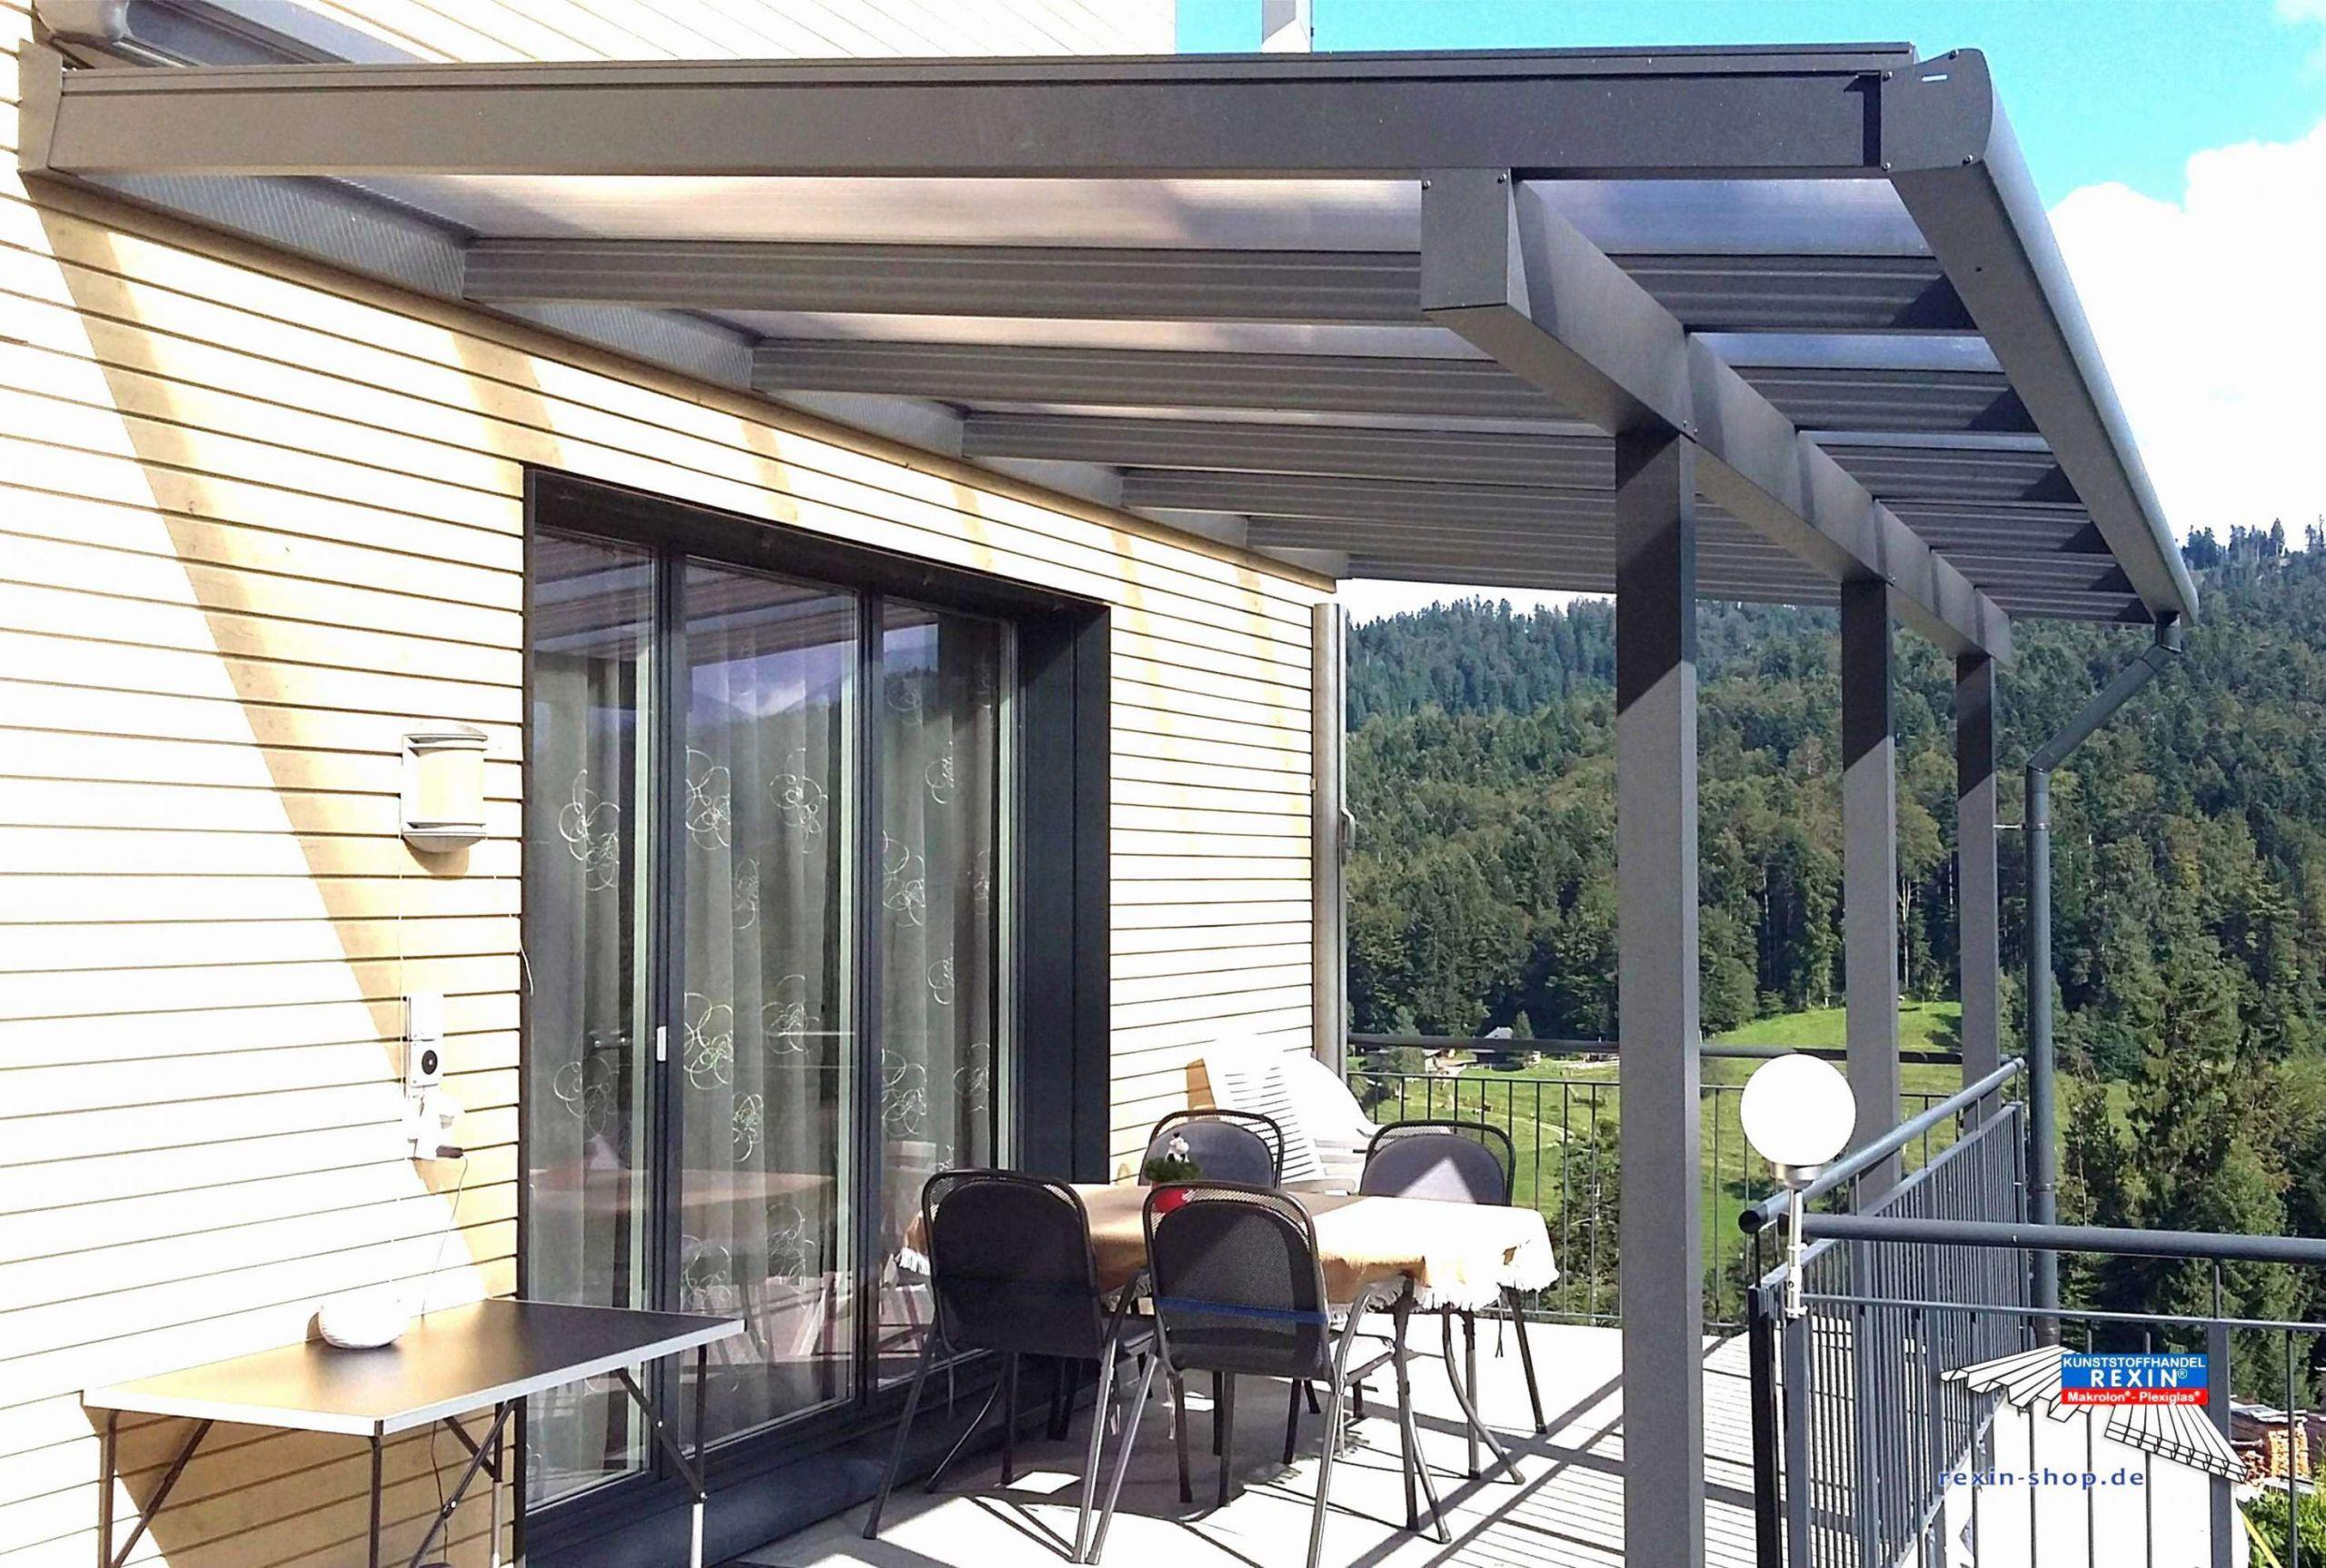 30 elegant betonwand garten verkleiden terrasse wand verkleiden terrasse wand verkleiden